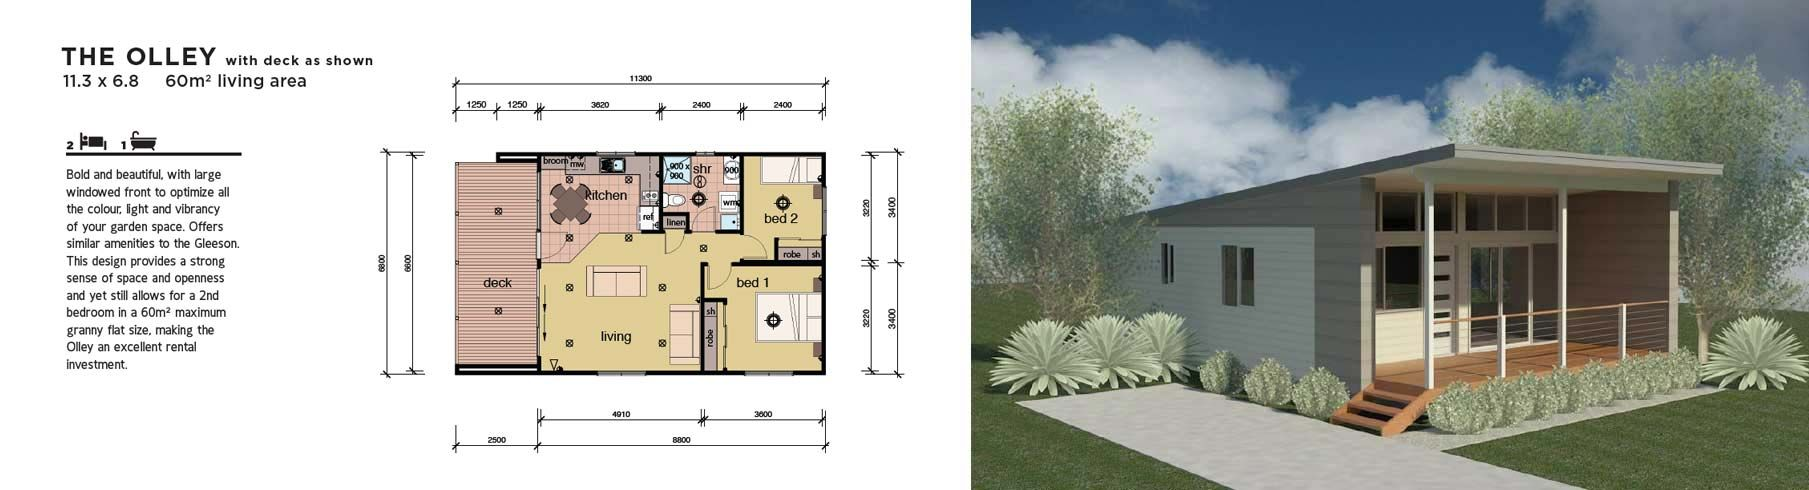 Simple 2 Bedroom House Designs Beauteous Modular Home Granny Flat 2 Bedroom  Homefloorplans Small Design Decoration